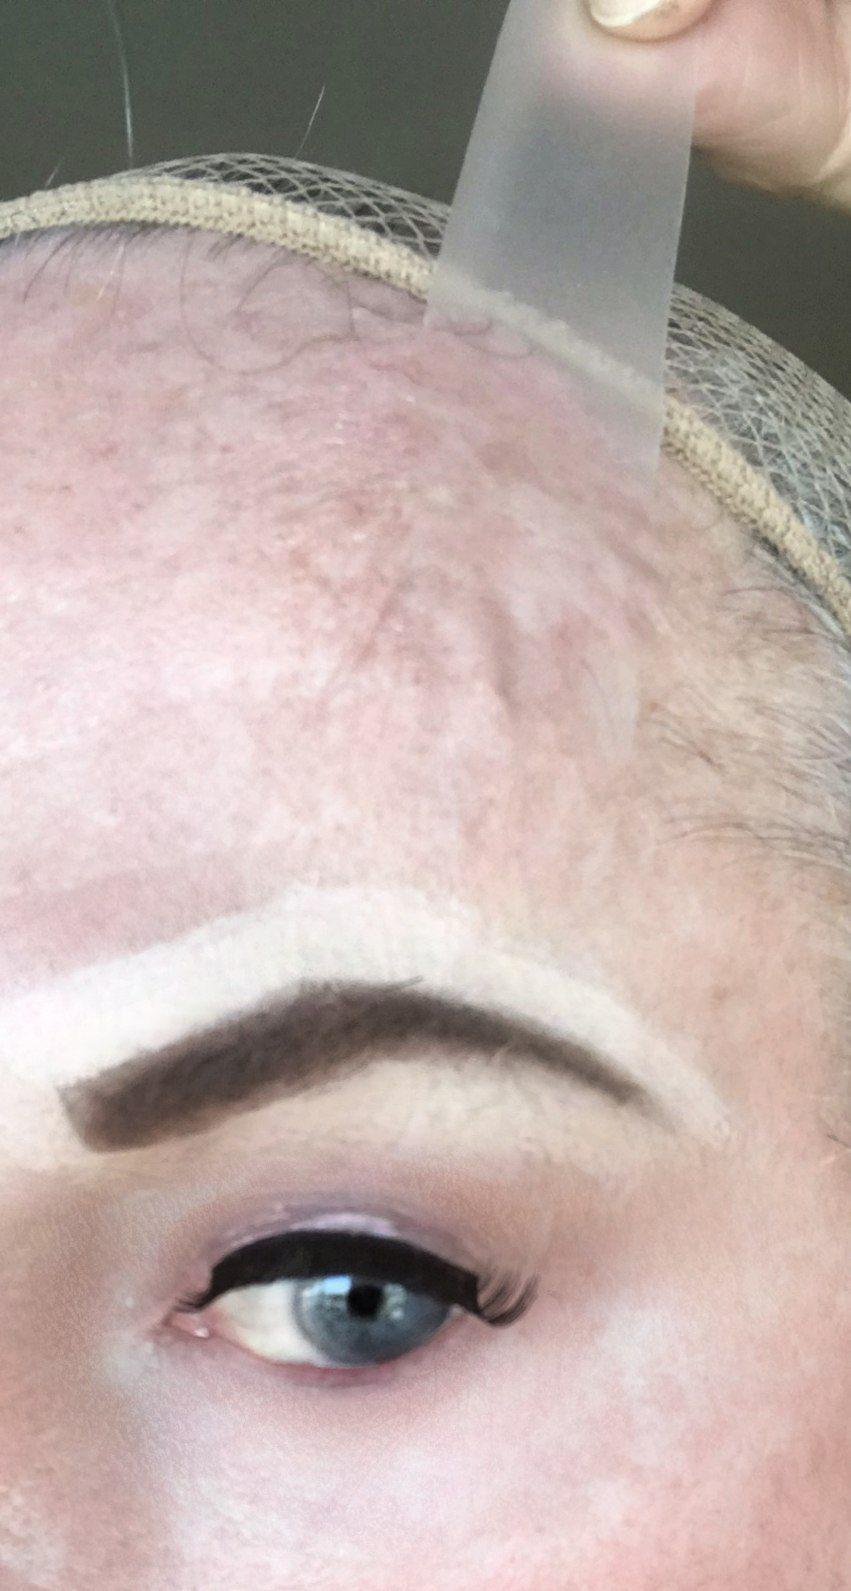 creating brow arch during crossdresser makeup